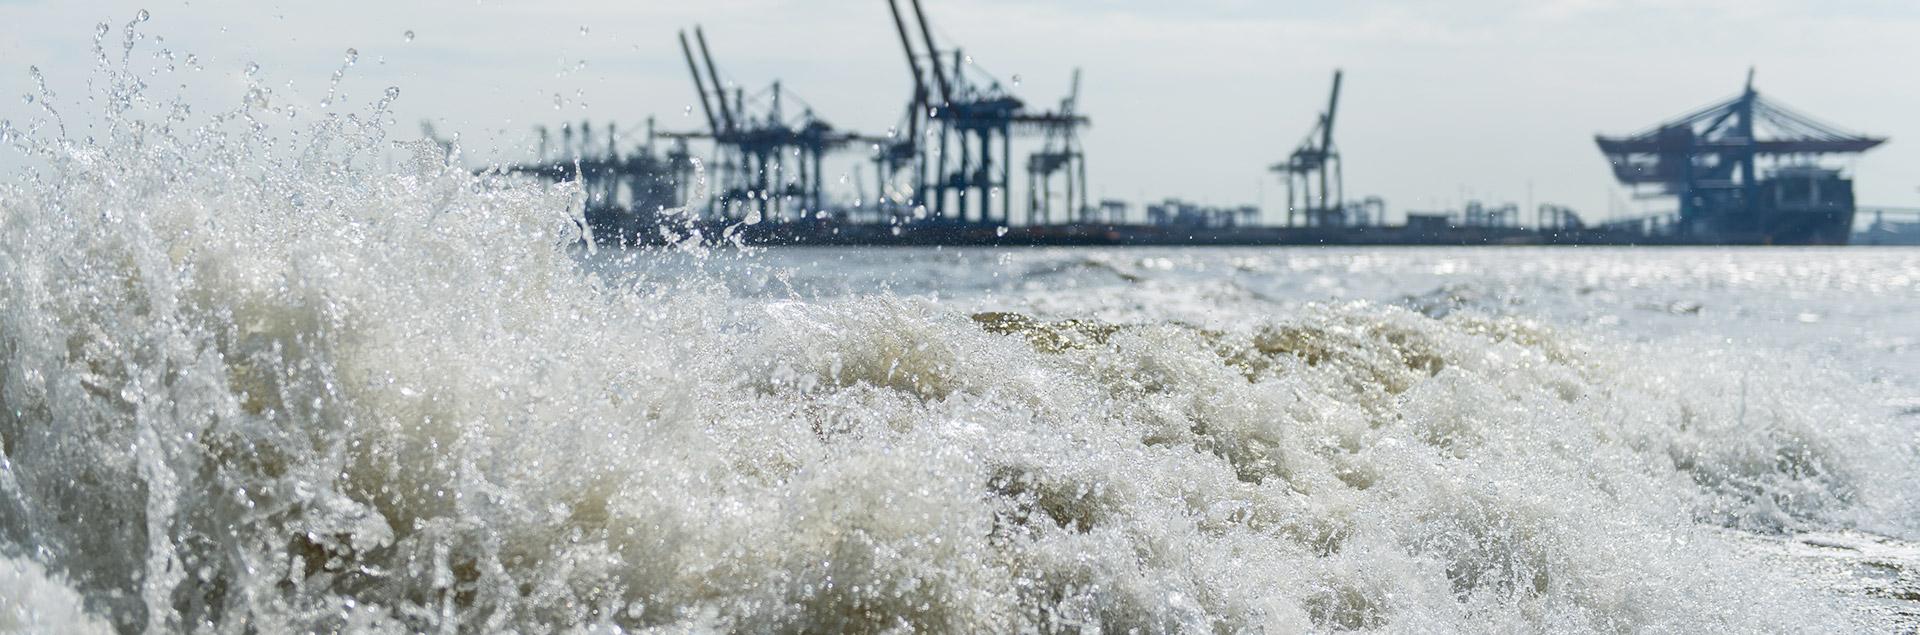 Hamburg port High tide wave